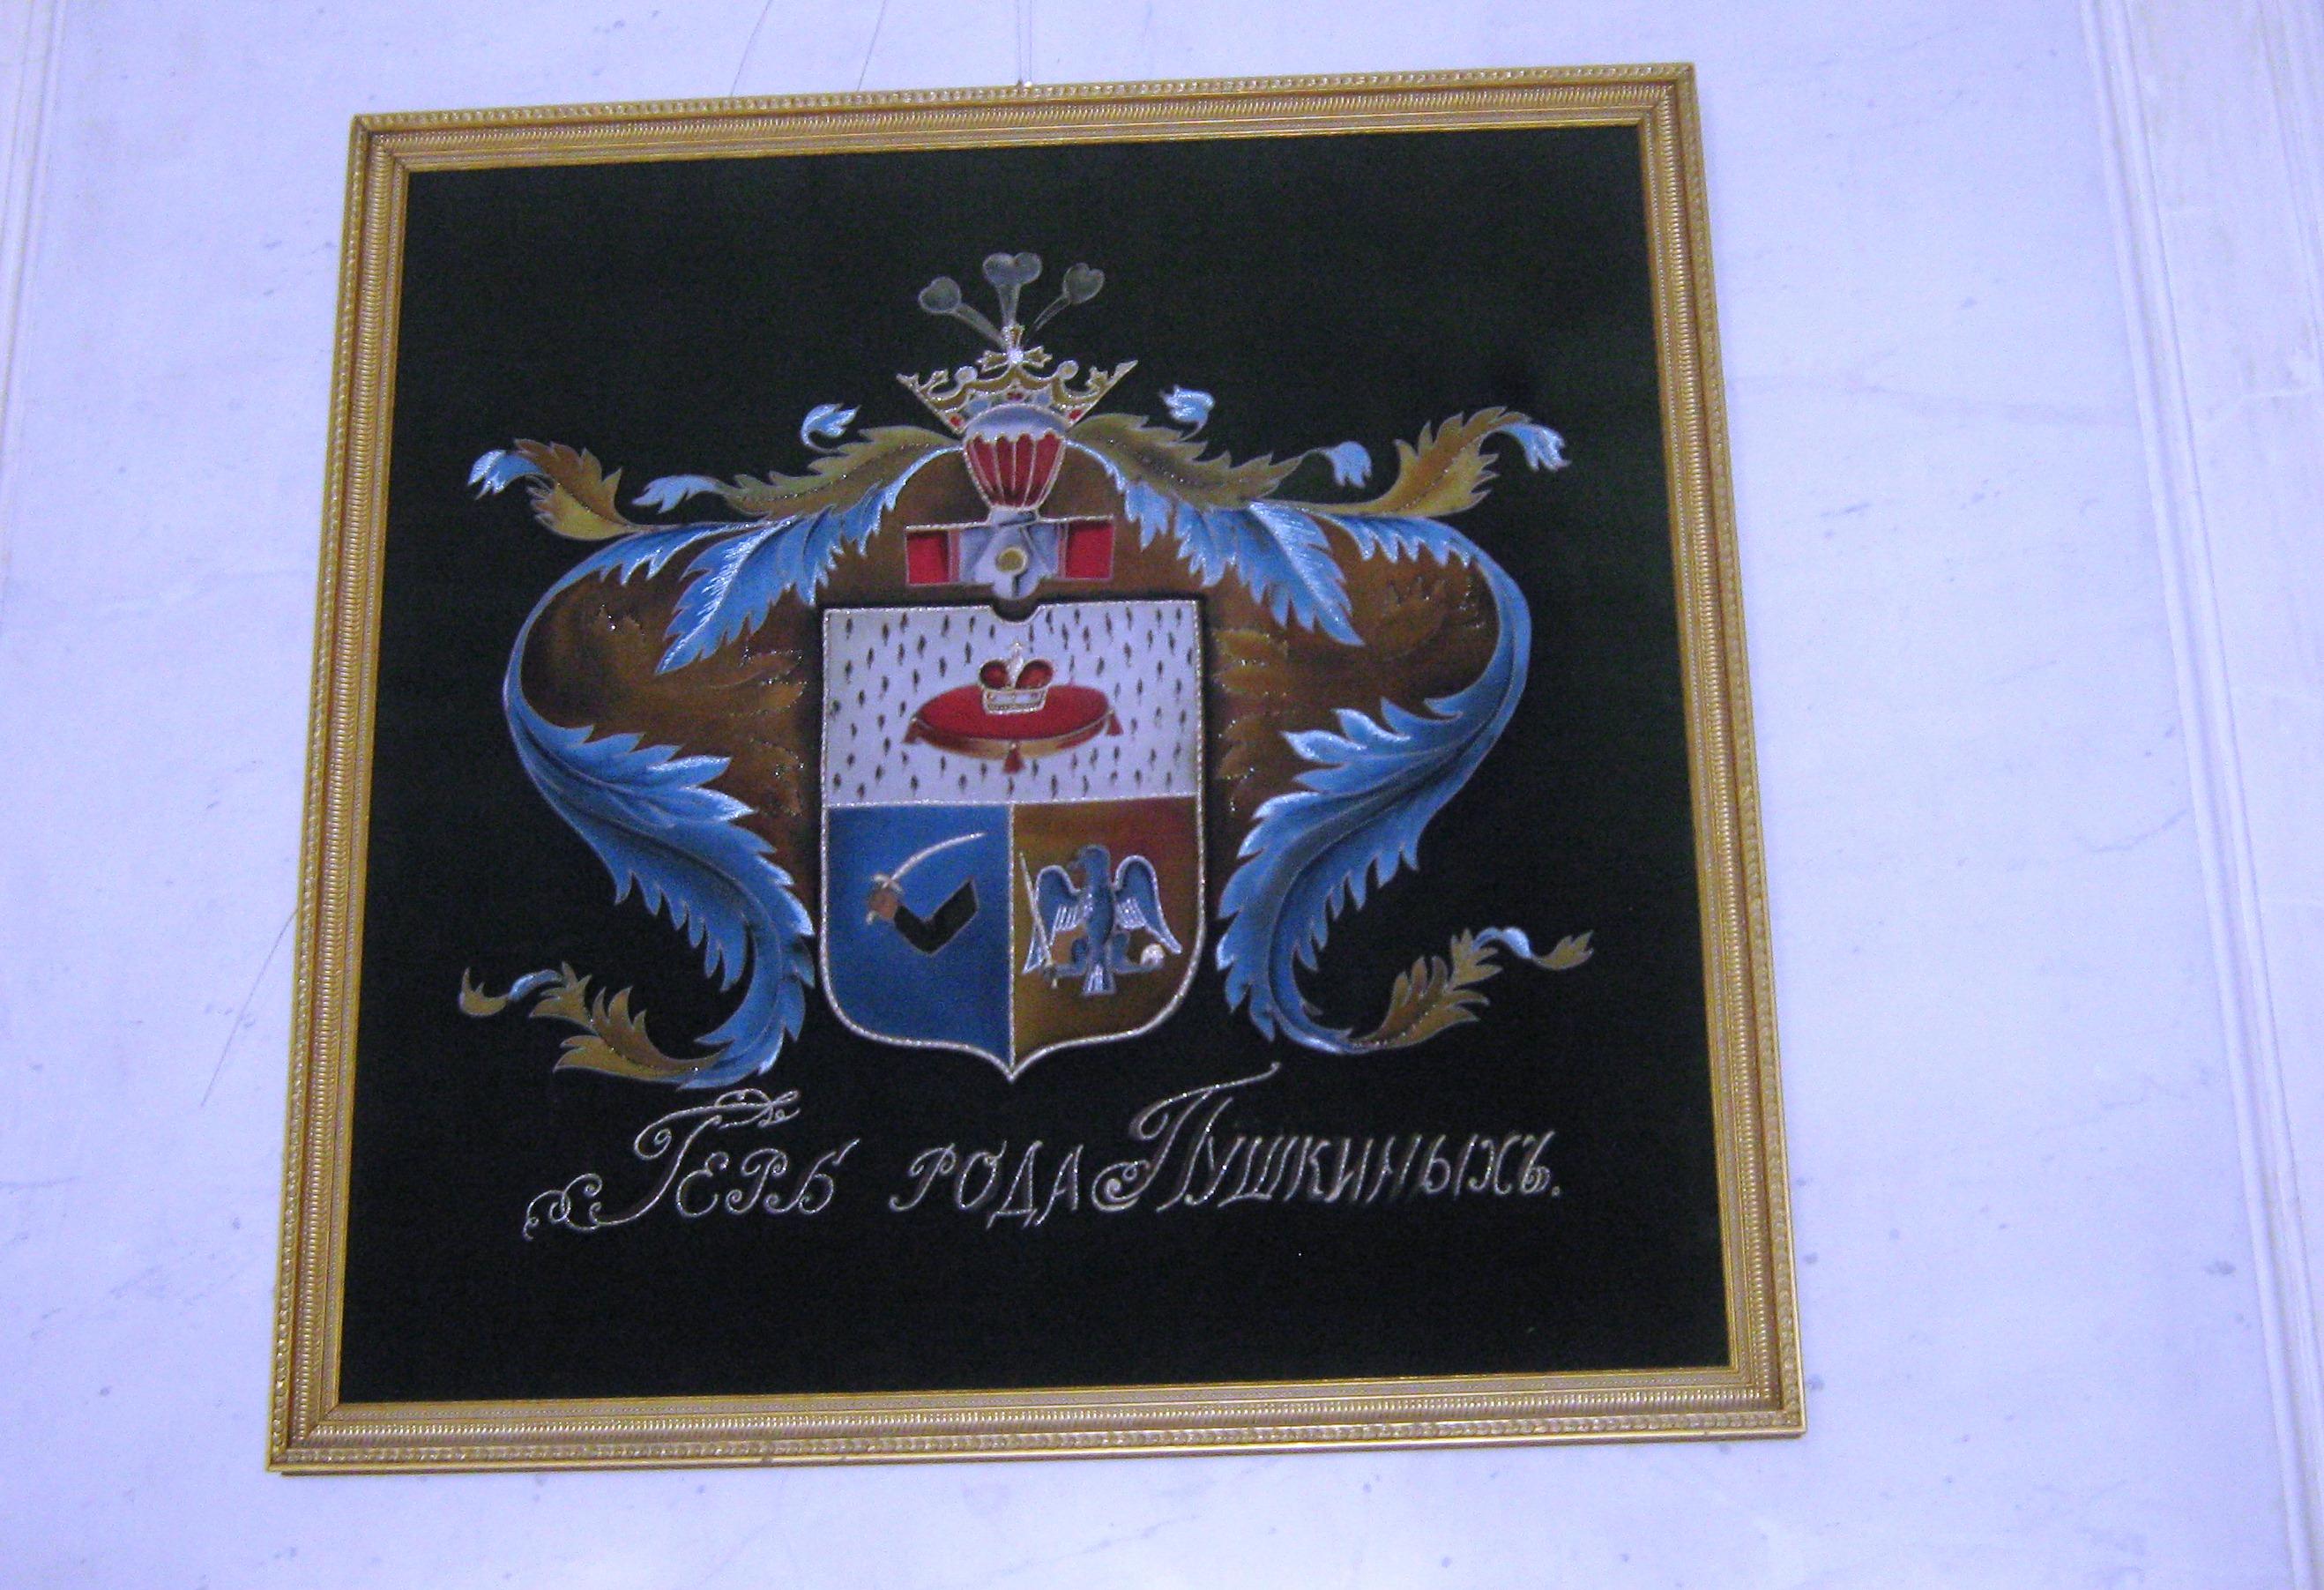 Grb porodice Puškin